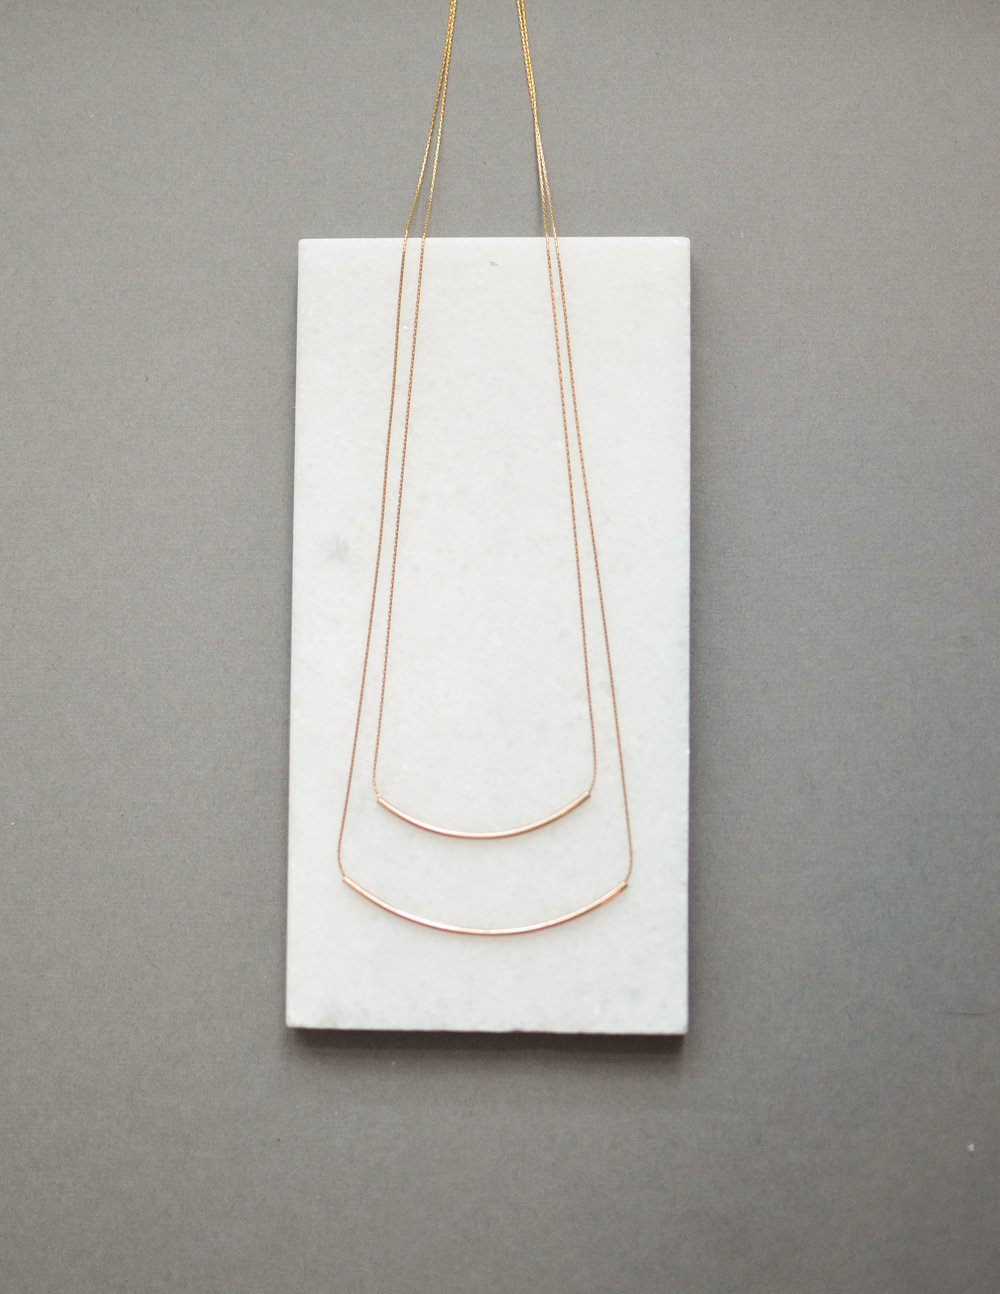 Samantha McIntosh Jewelry